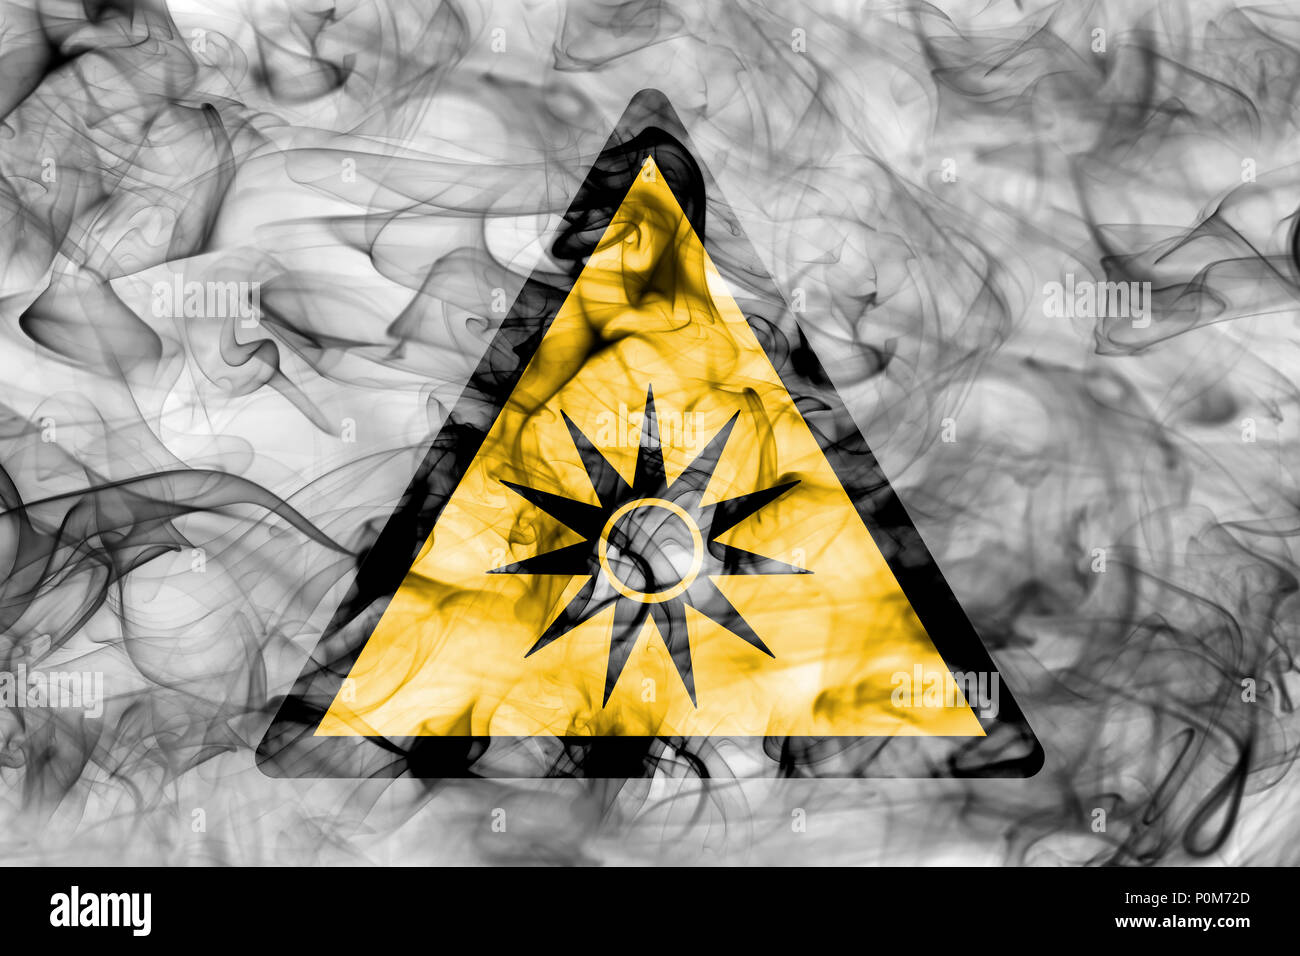 Optical radiation hazard warning smoke sign. Triangular warning hazard sign, smoke background. Stock Photo